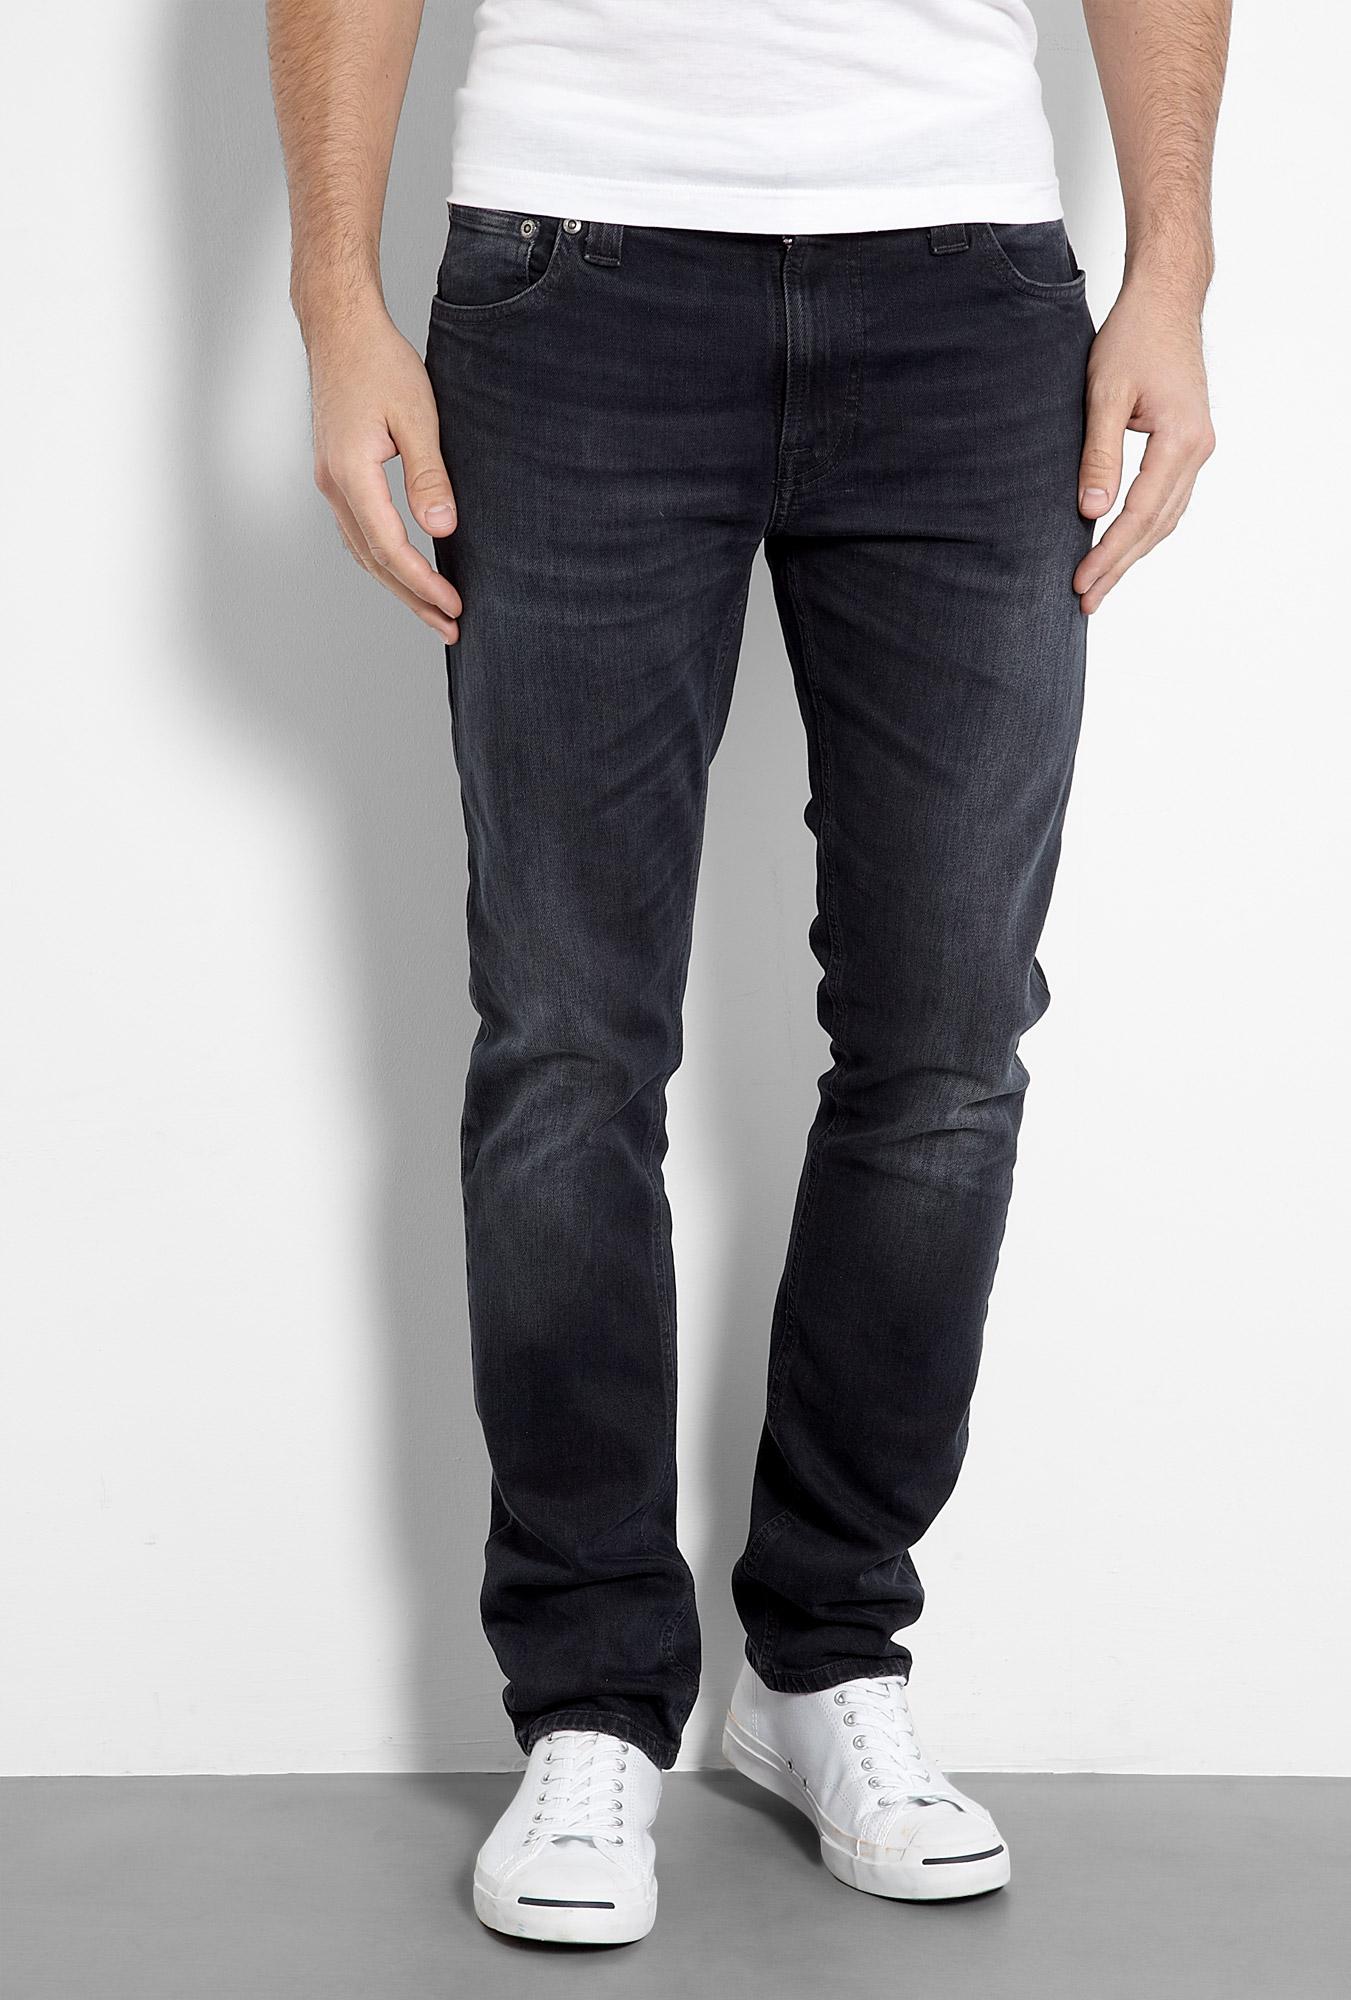 nudie jeans thin finn organic black grey wash skinny jeans. Black Bedroom Furniture Sets. Home Design Ideas